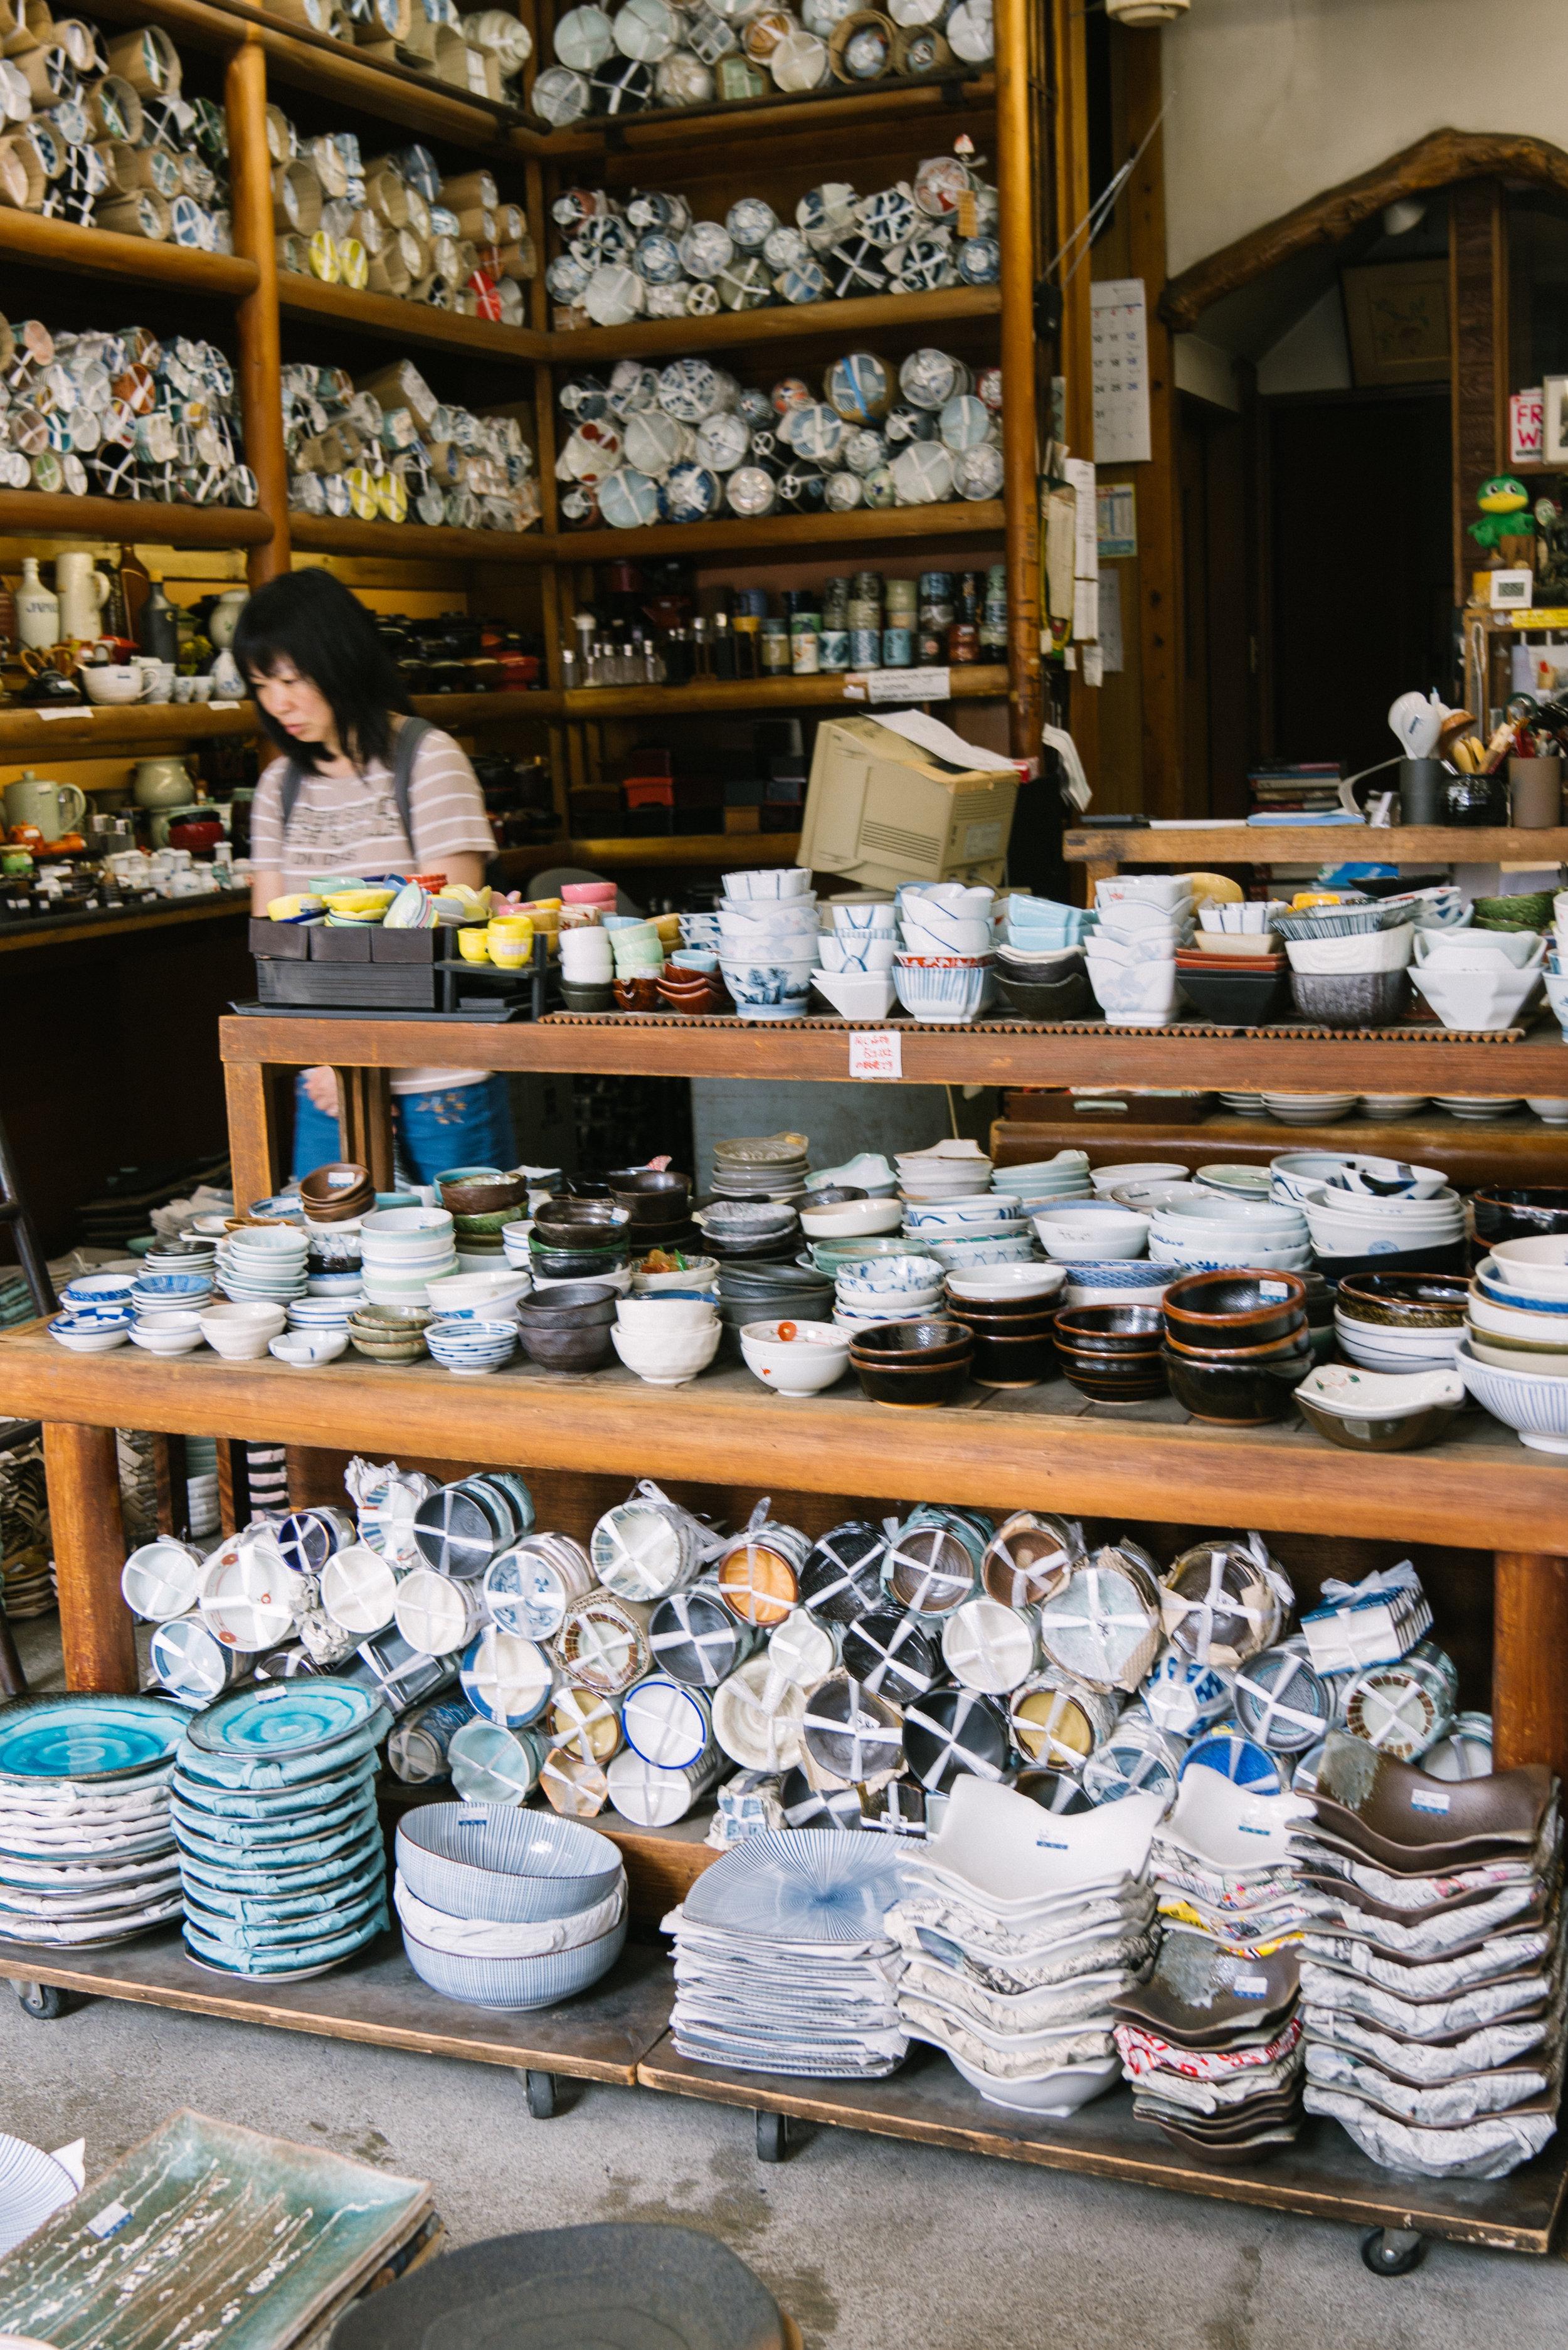 kappabashi kitchen market, tokyo japan